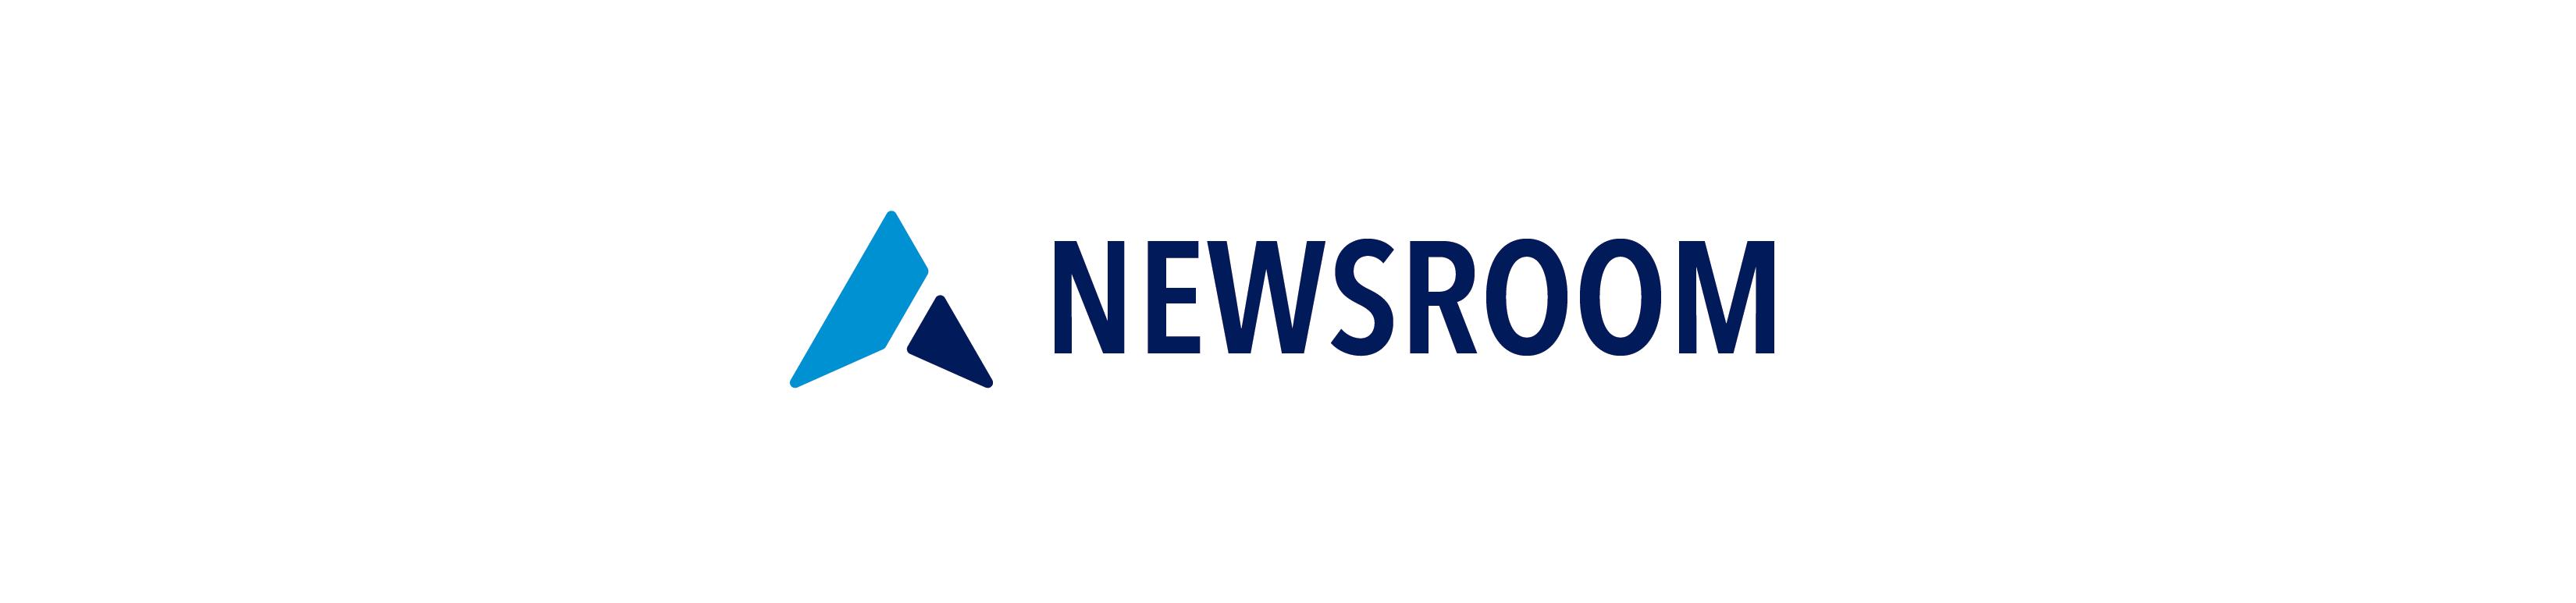 Aspiria Newsroom